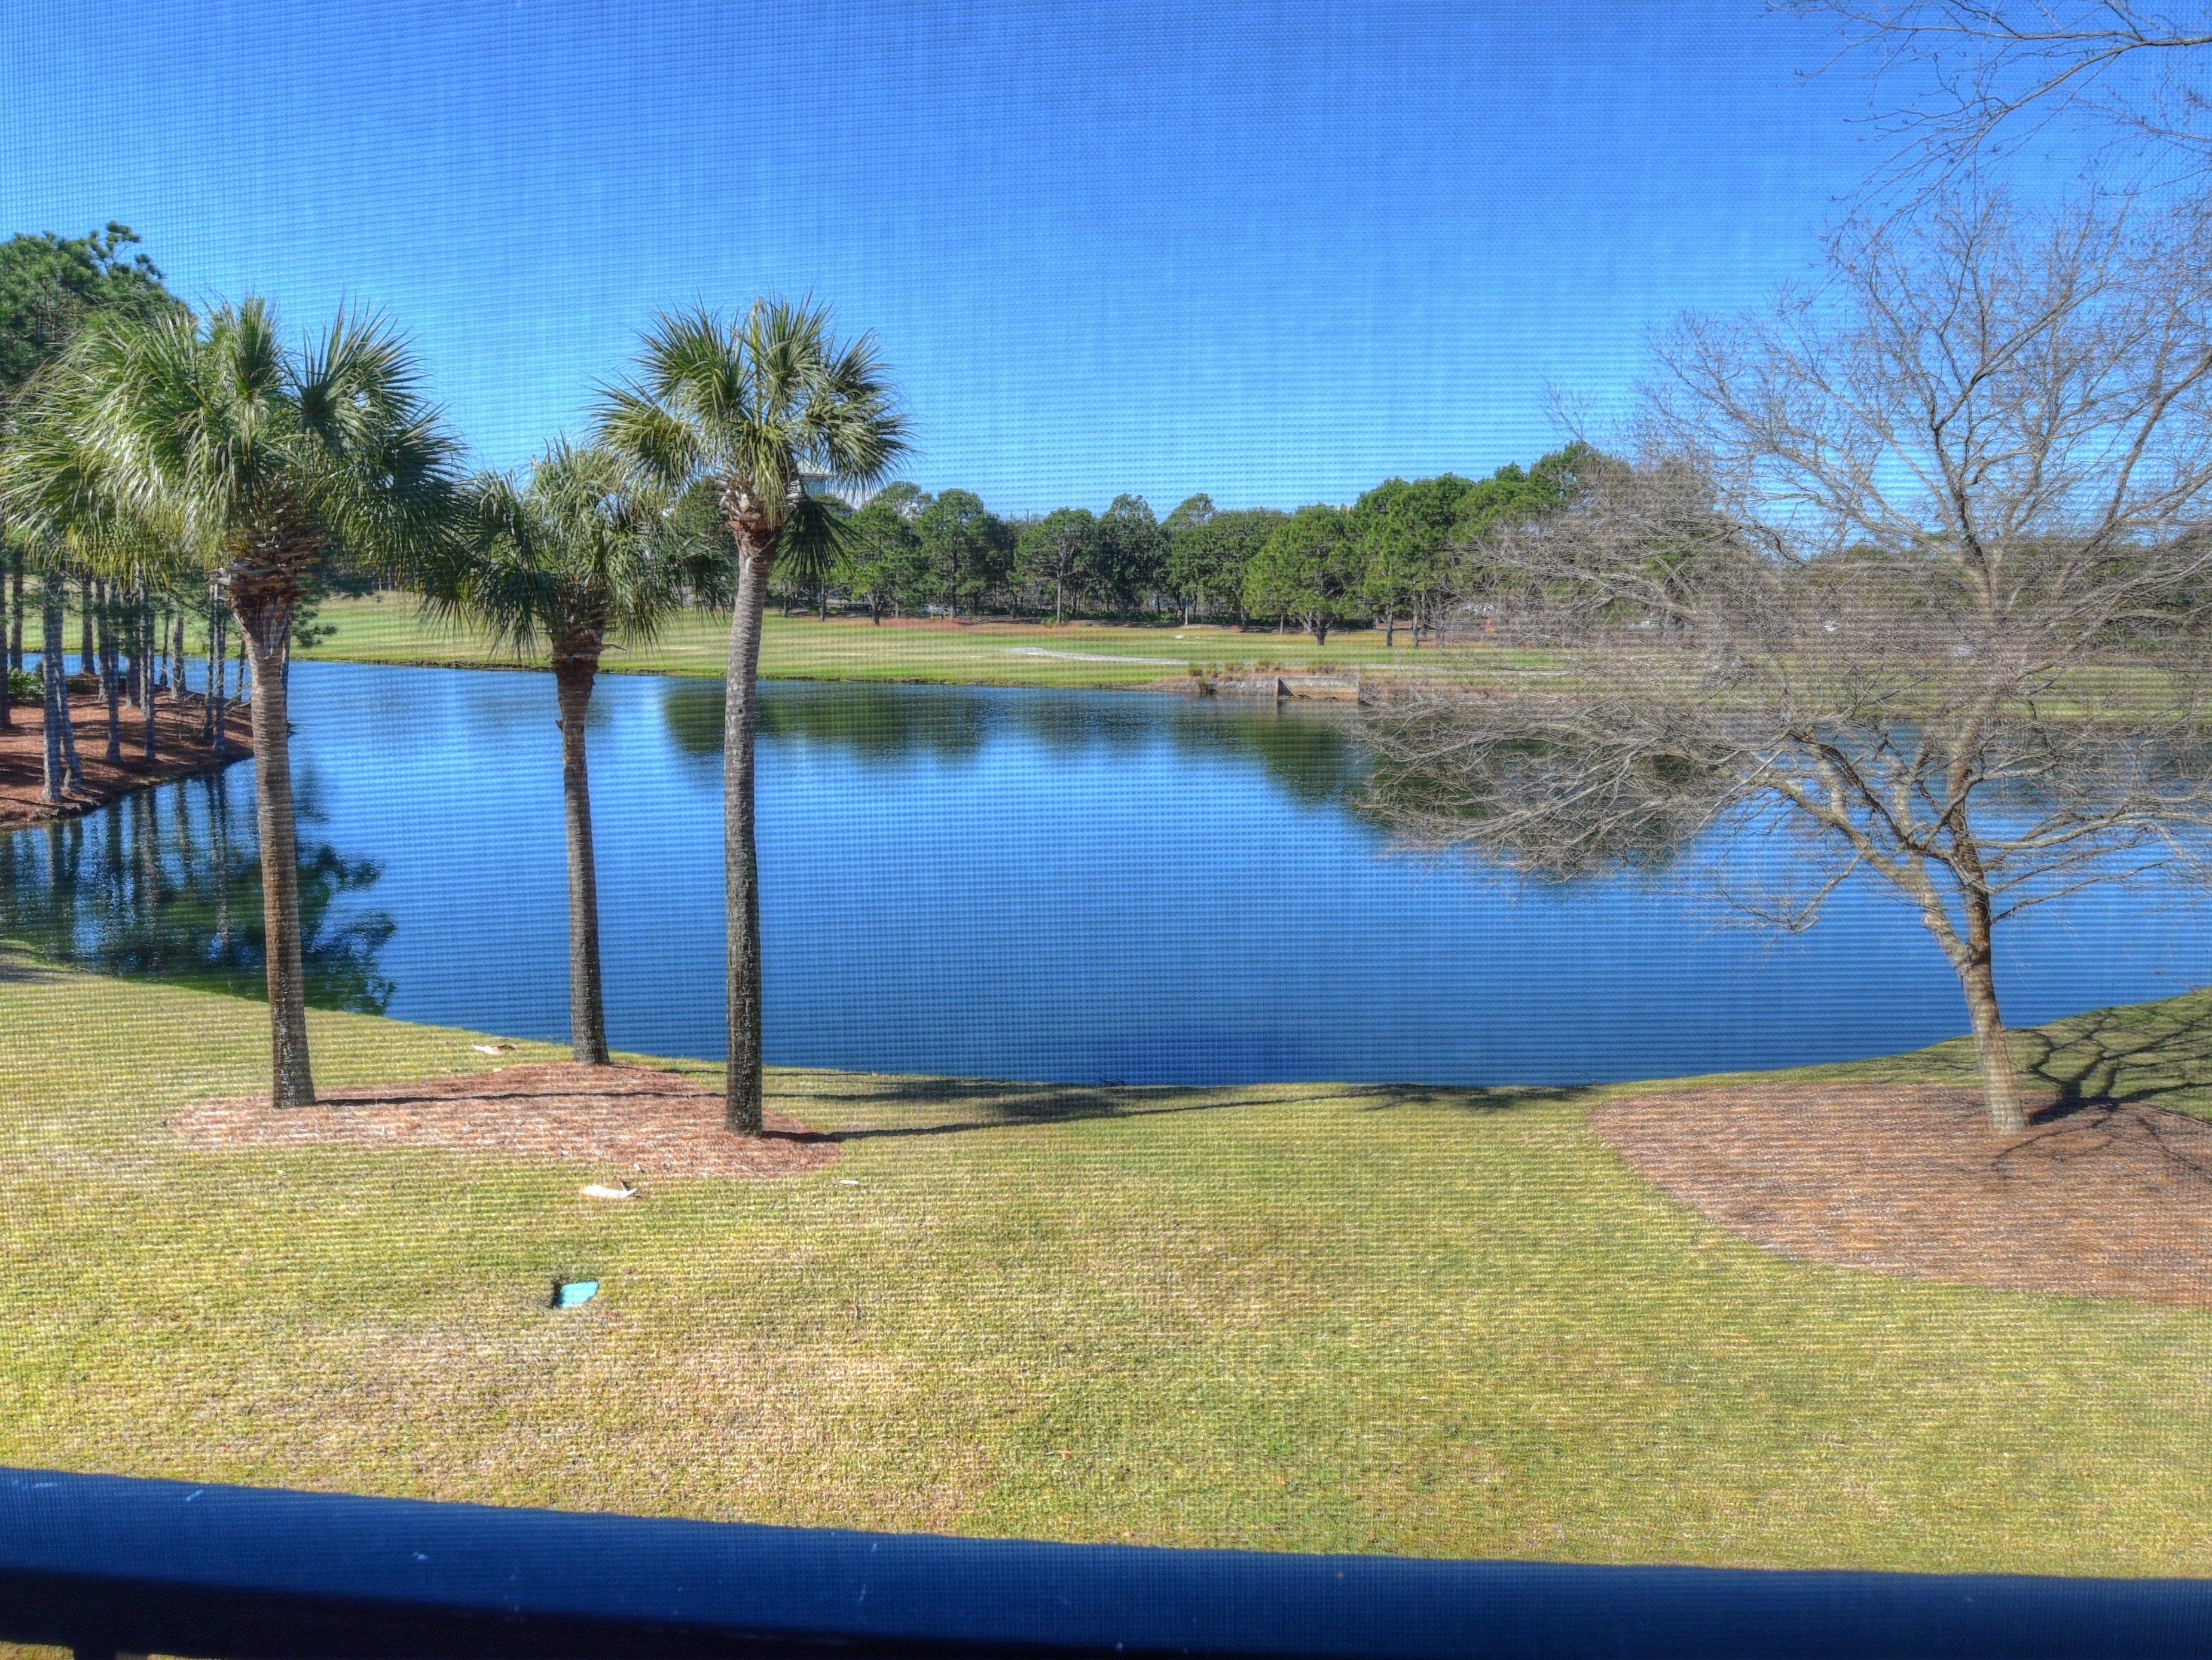 8511 Turnberry Condo rental in Sandestin Rentals ~ Cottages and Villas  in Destin Florida - #29